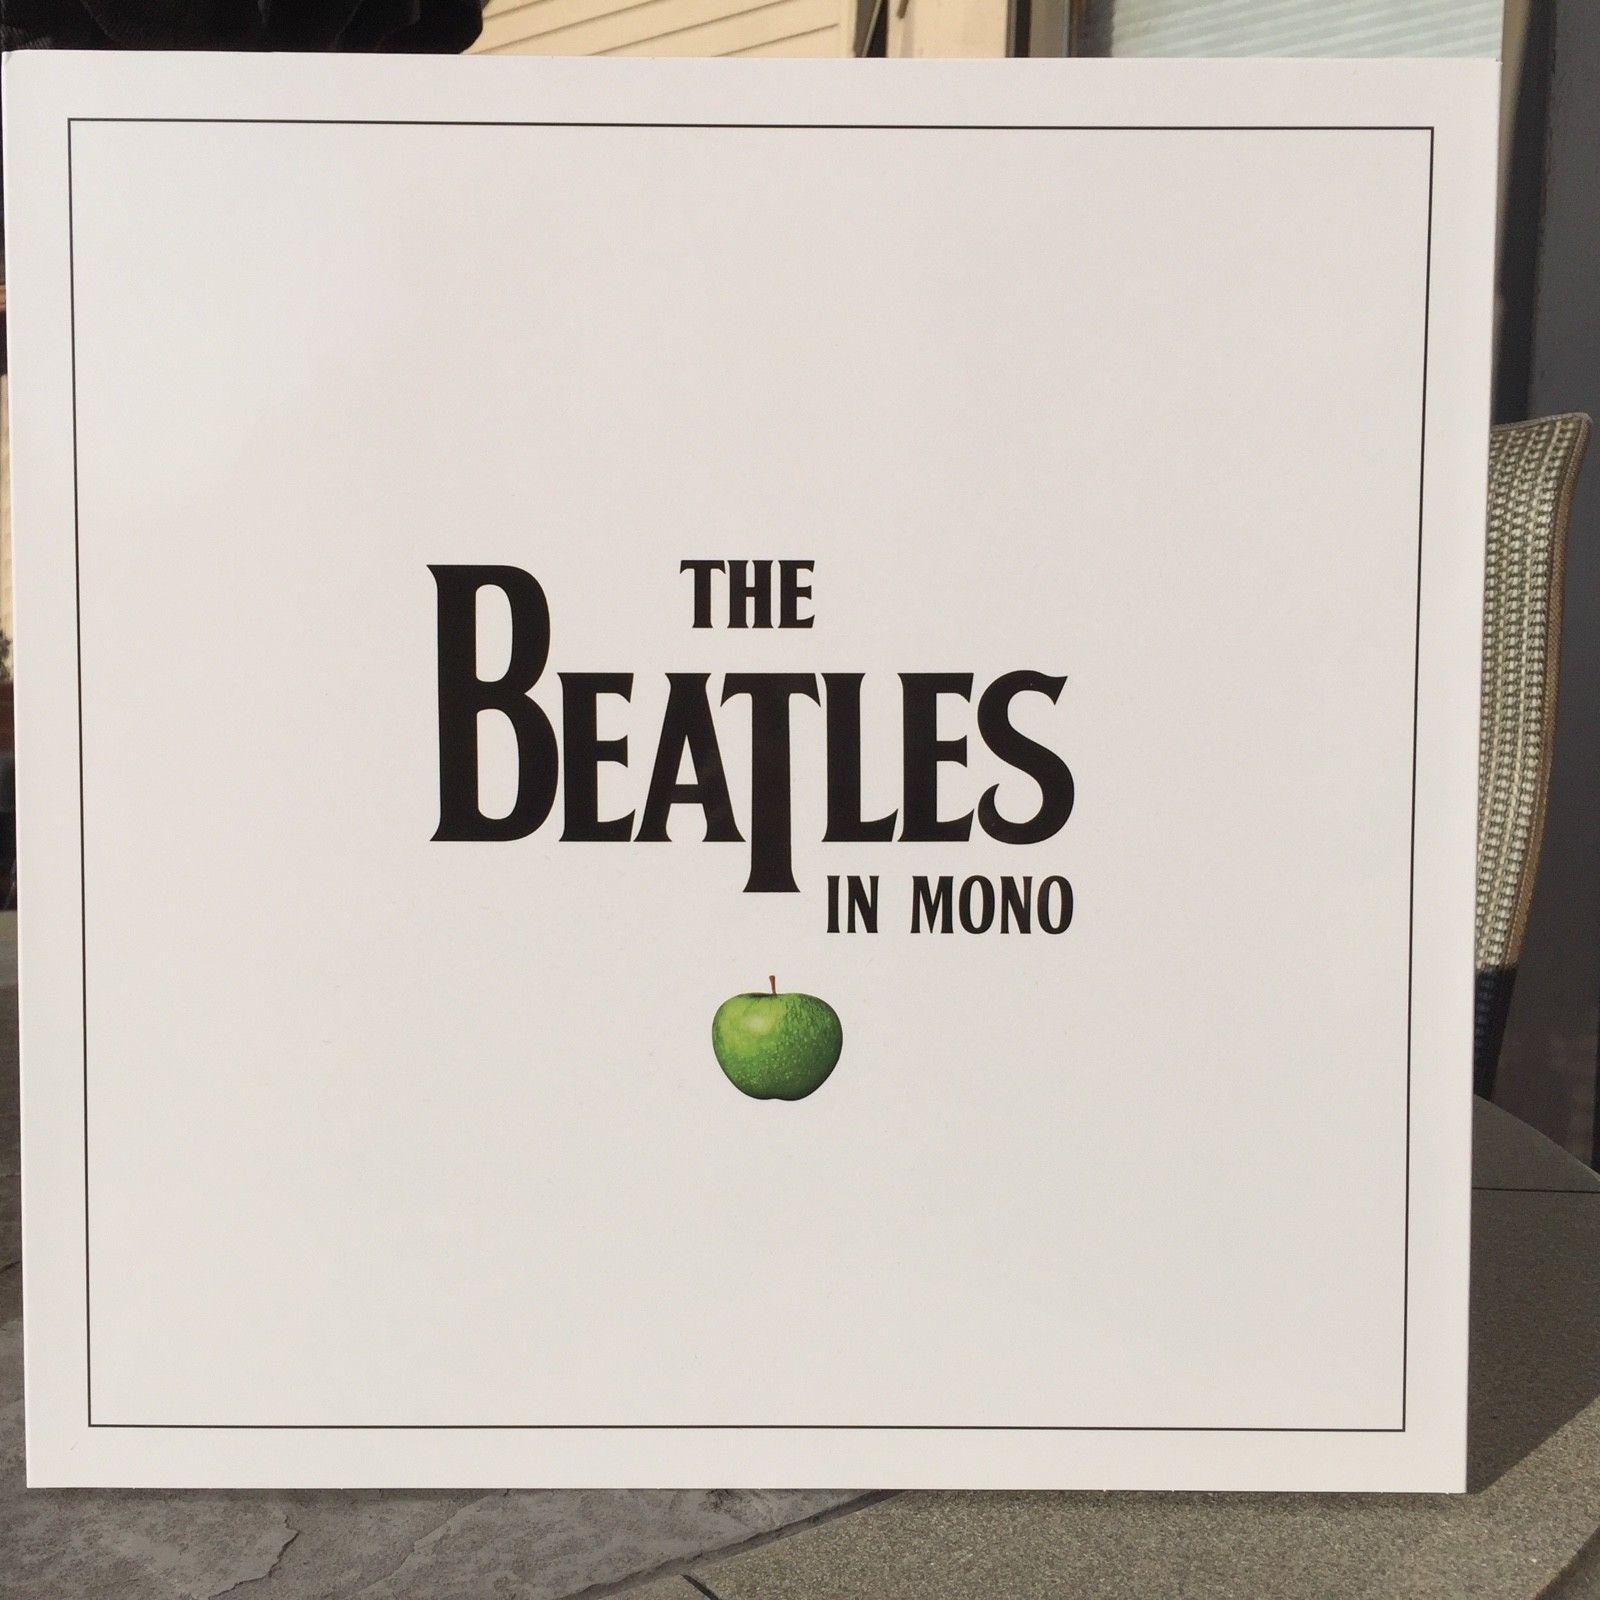 THE BEATLES IN MONO SEALED 14 180G VINYL LP + BOOK BOX SET